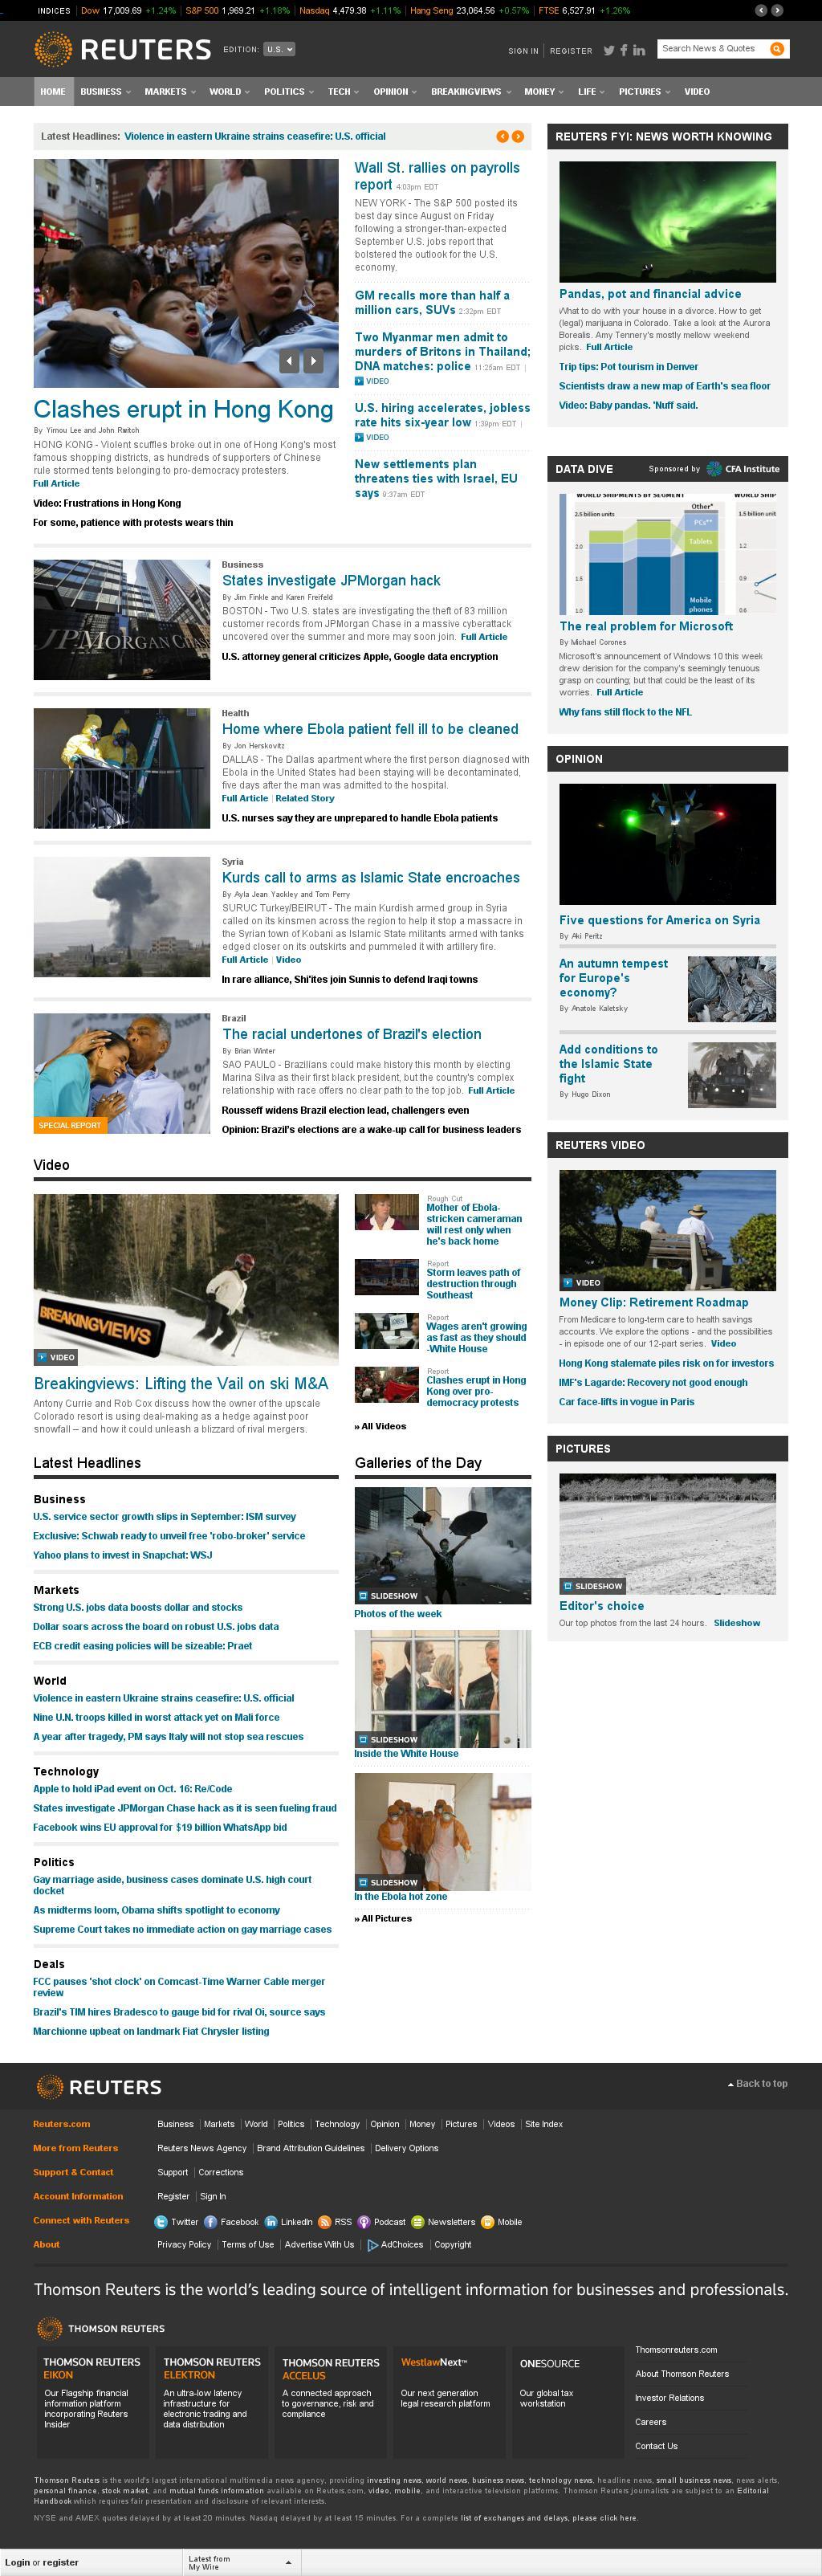 Reuters at Friday Oct. 3, 2014, 8:14 p.m. UTC